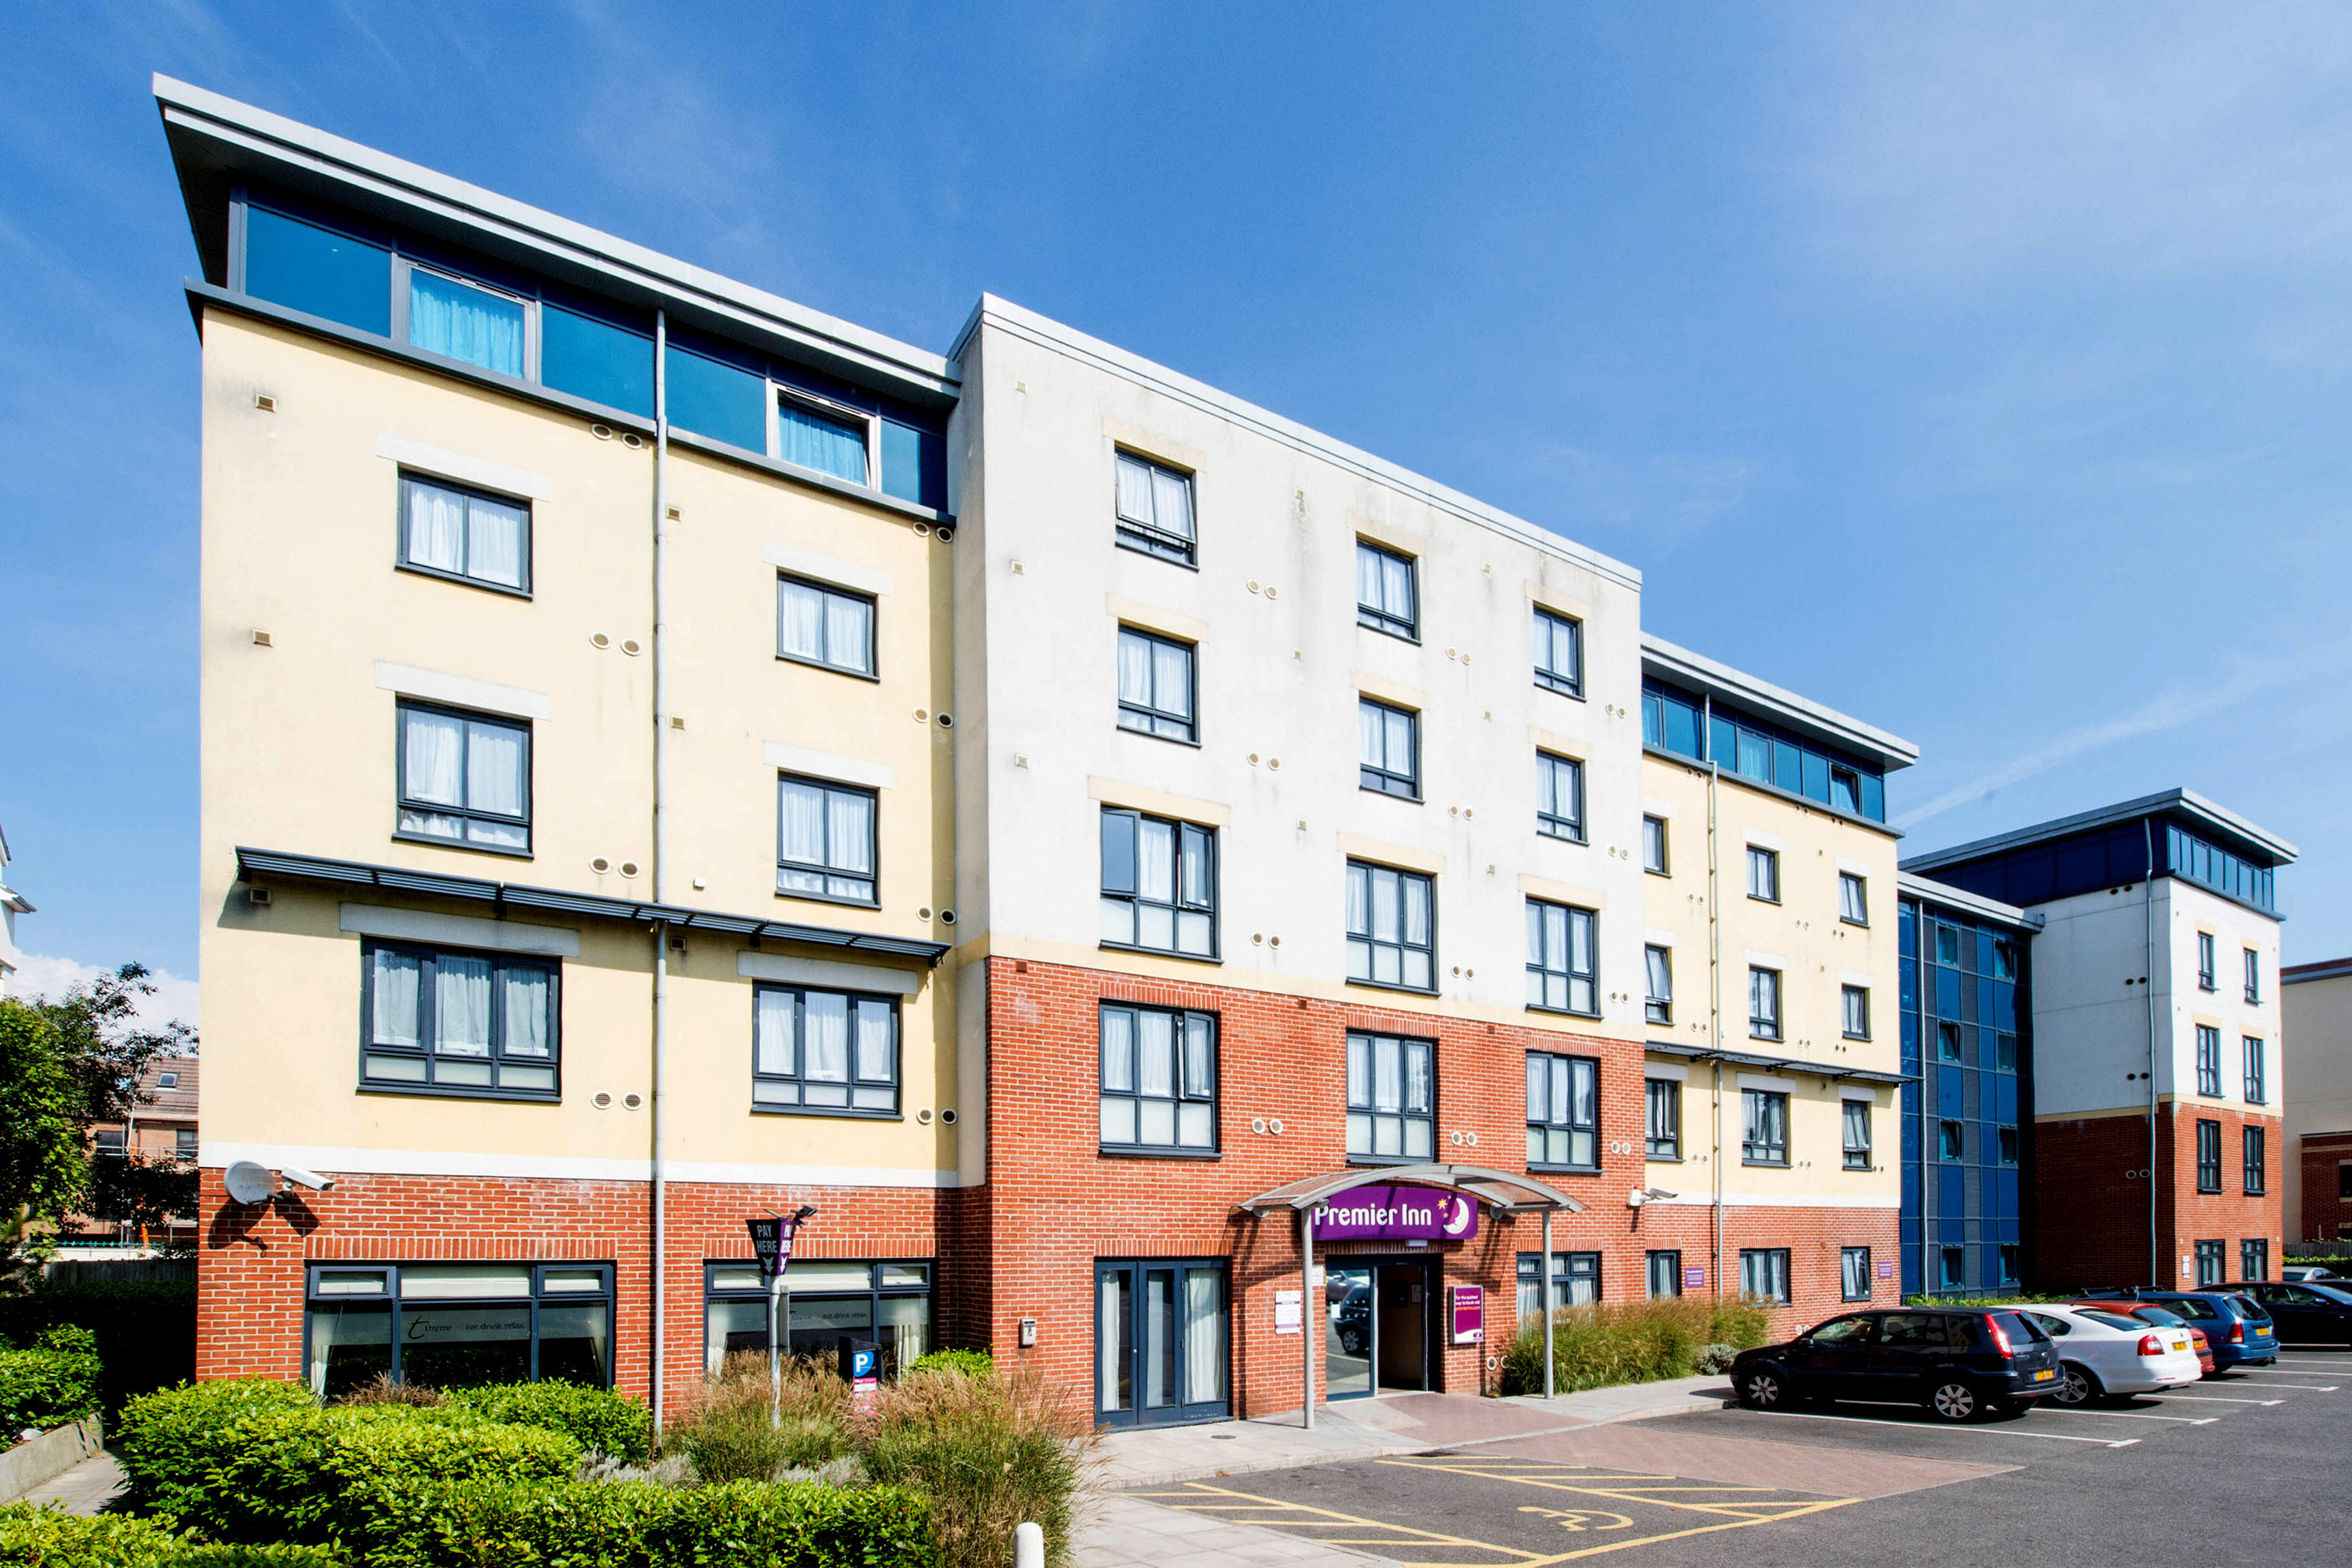 Premier Inn Bournemouth Westbourne hotel